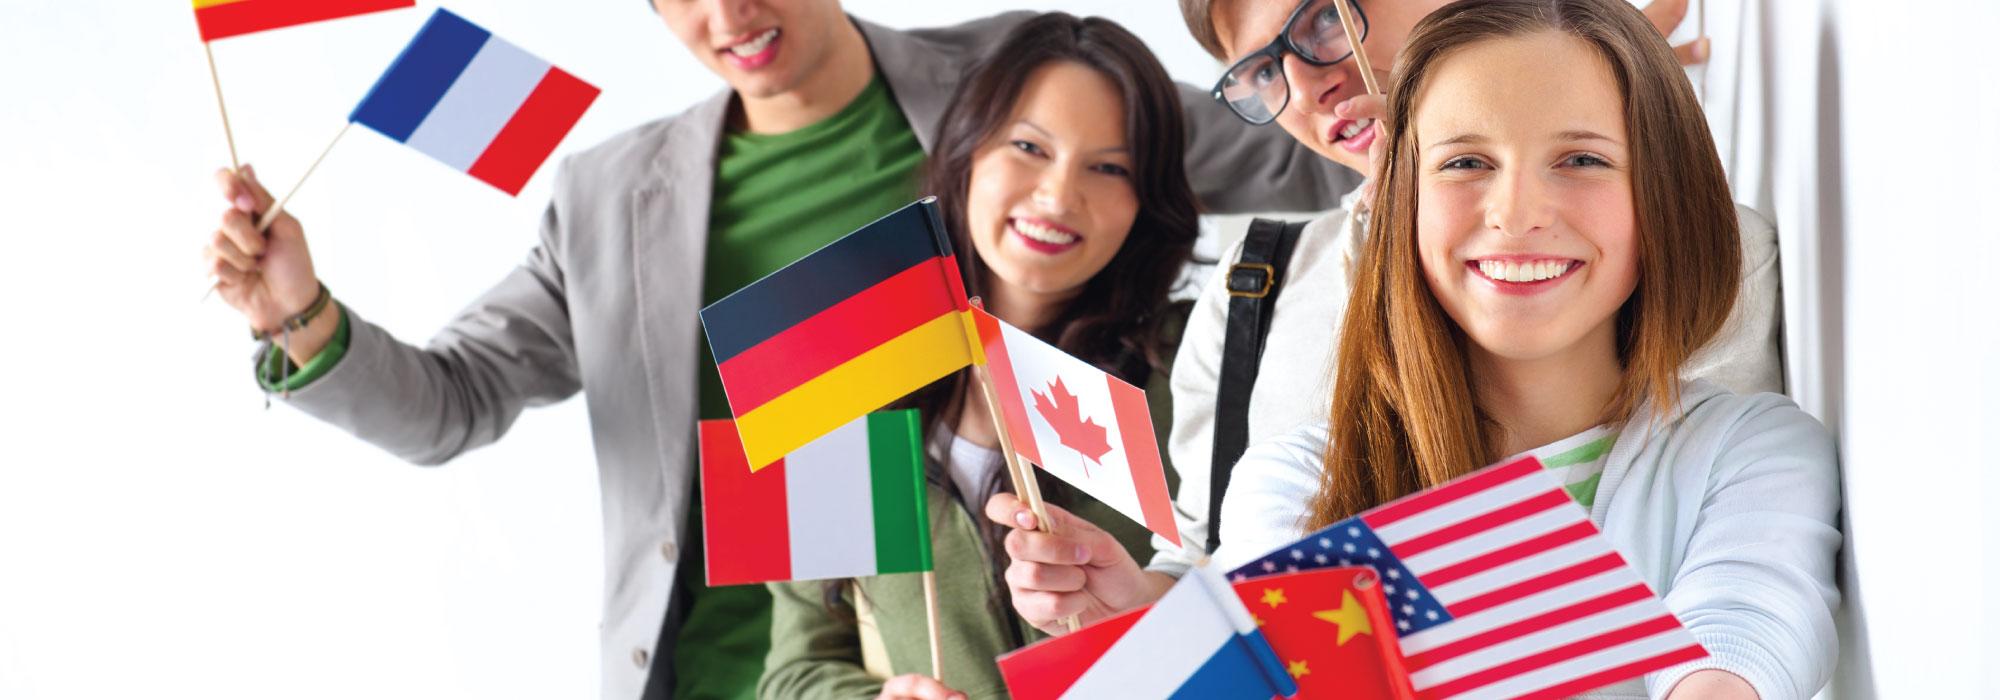 Do you Know China ranks 3rd study destination globally?